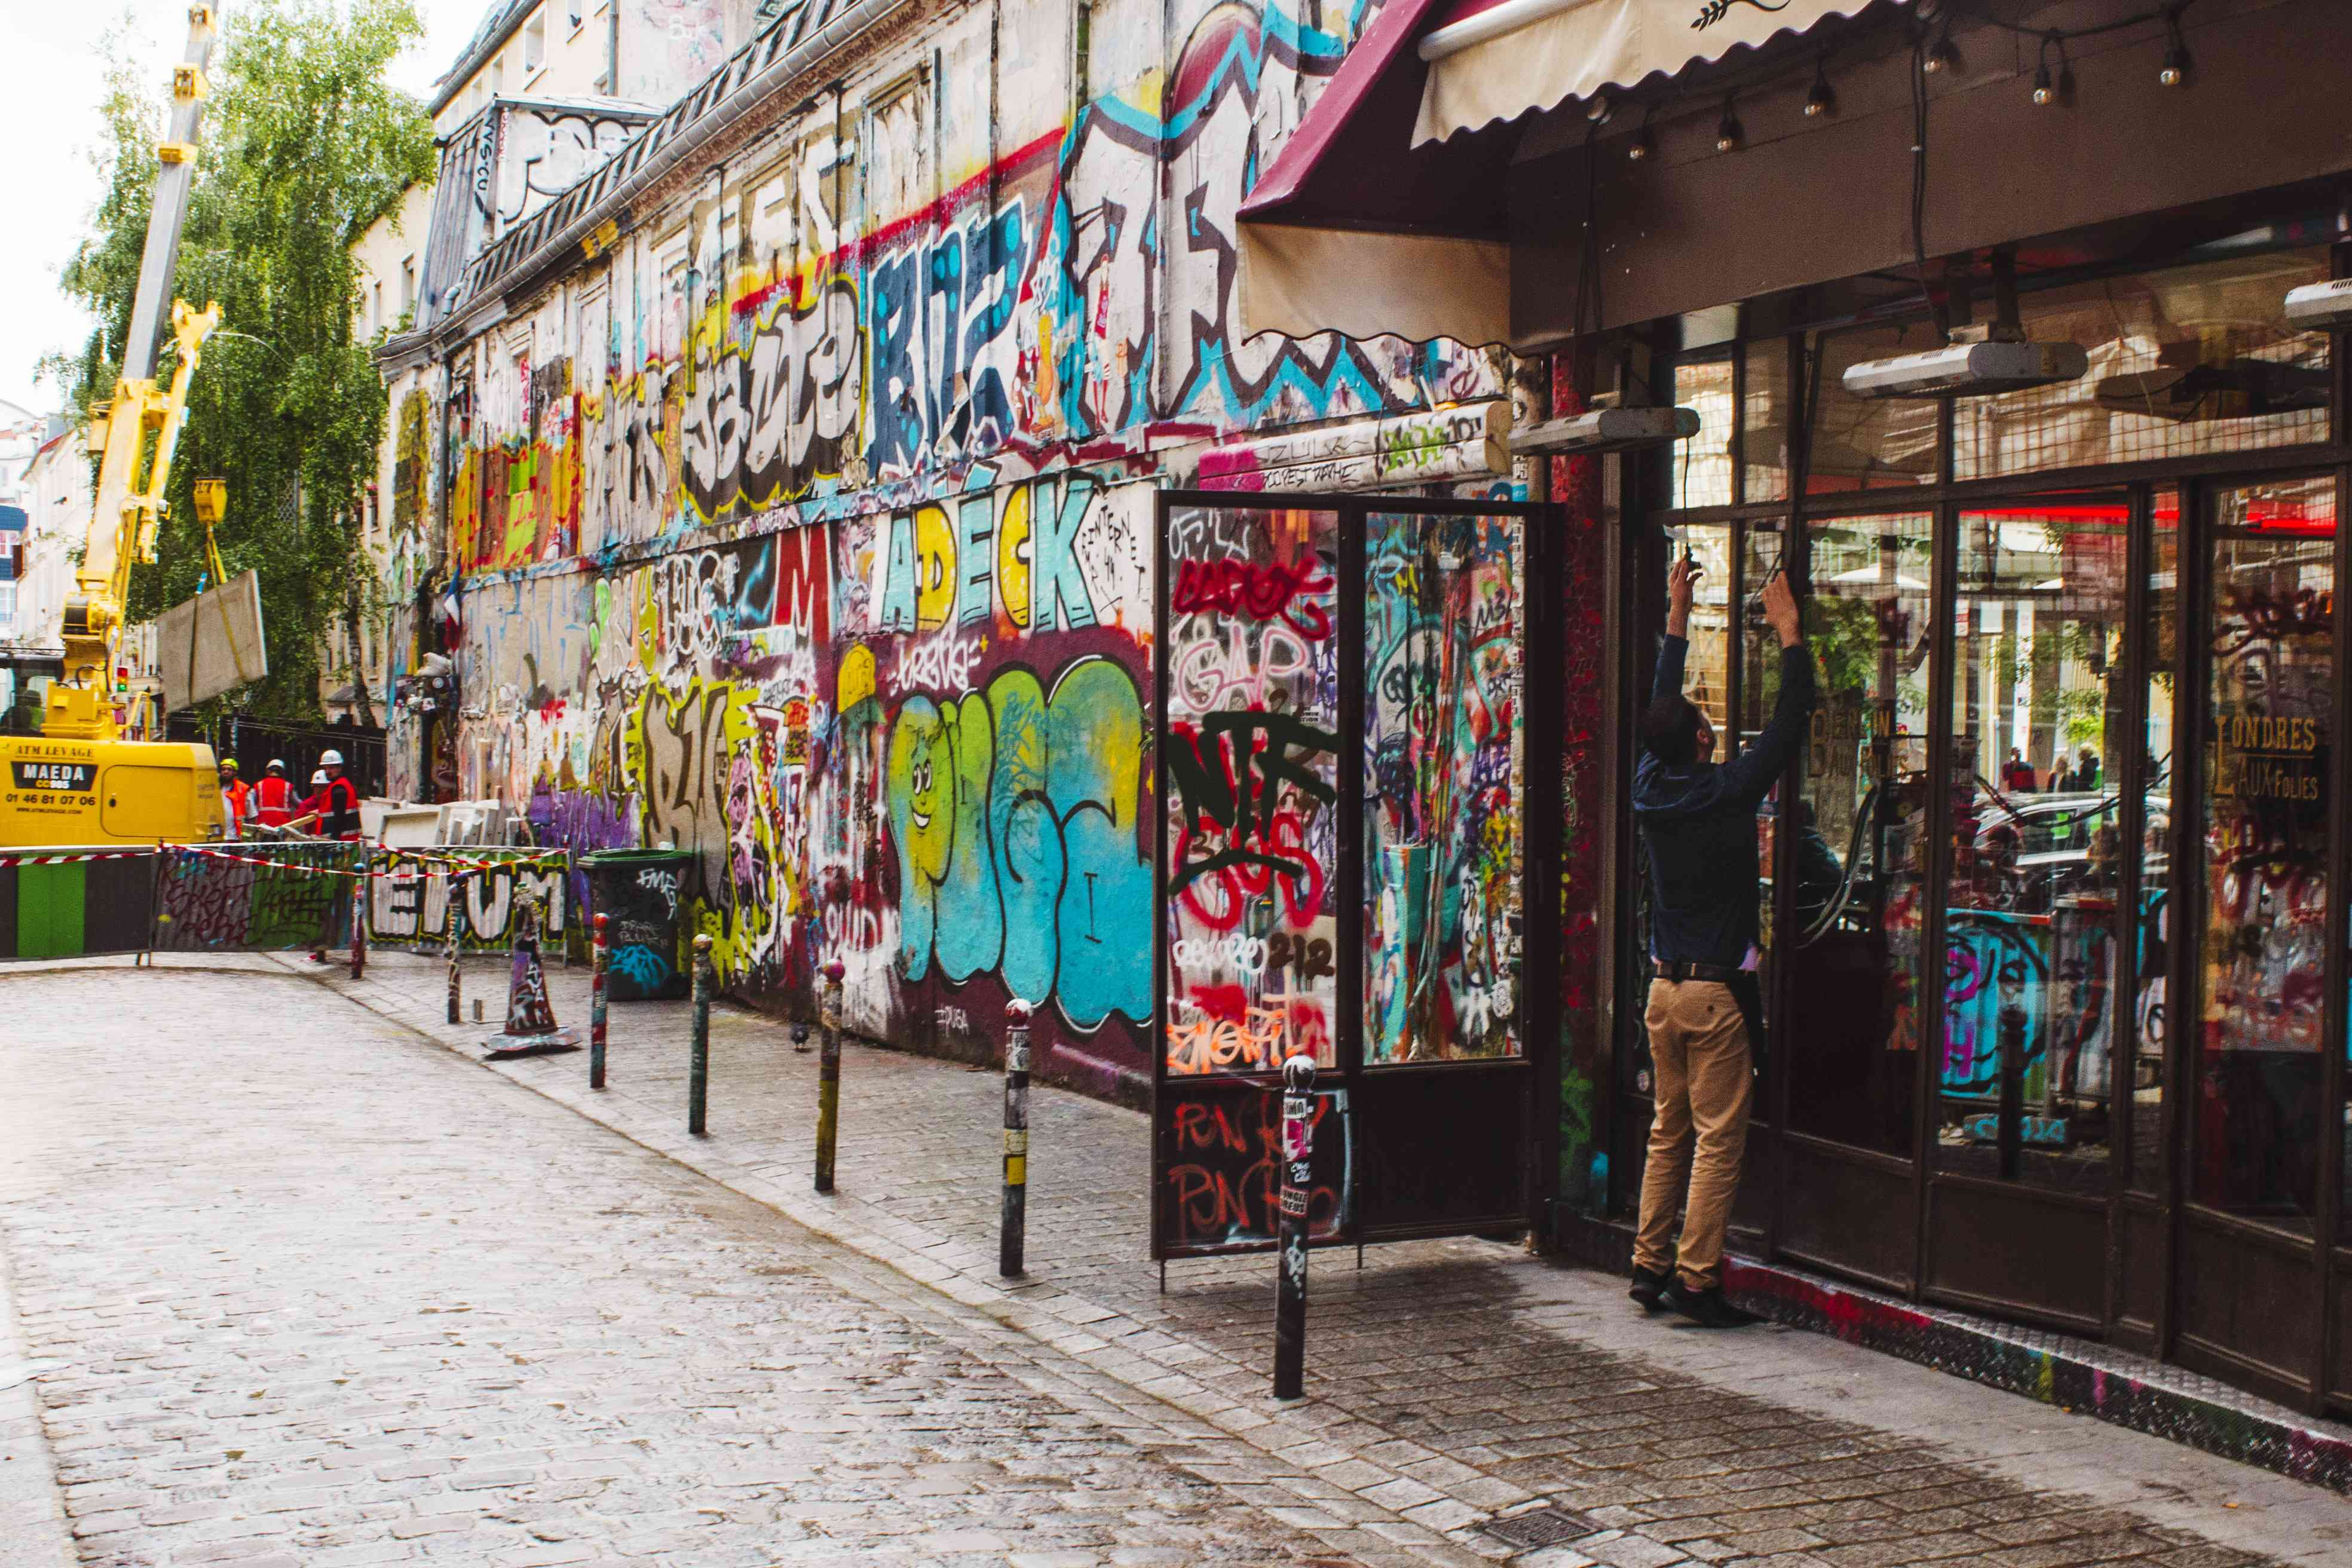 Graffiti covered street in Belleville